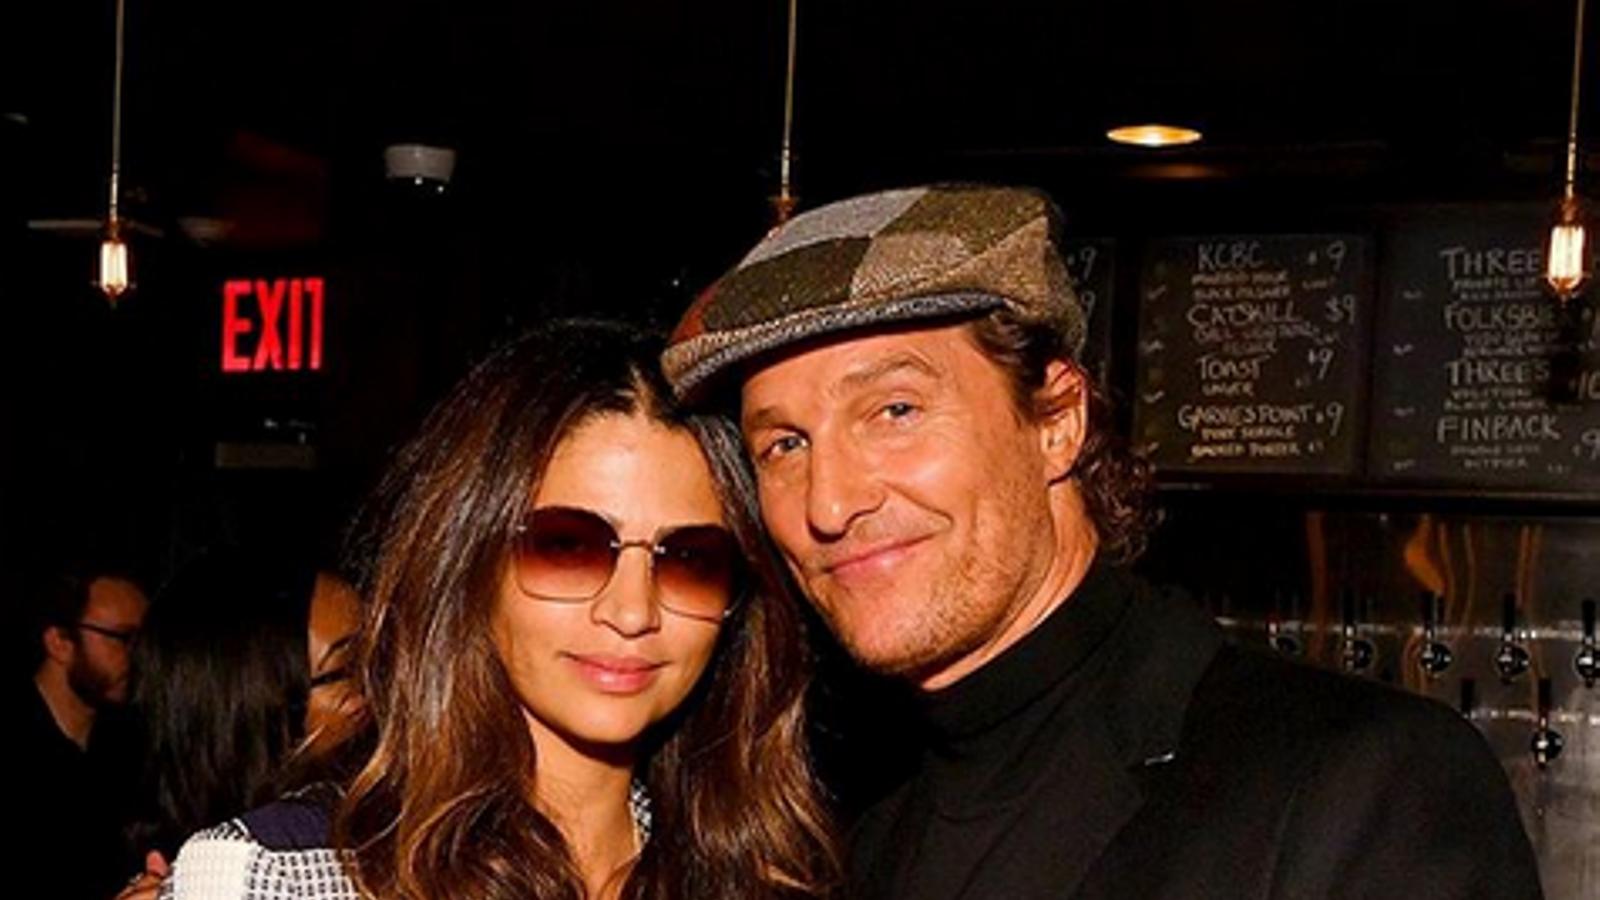 Matthew McConaughey amb la seva companya, Camila Alves